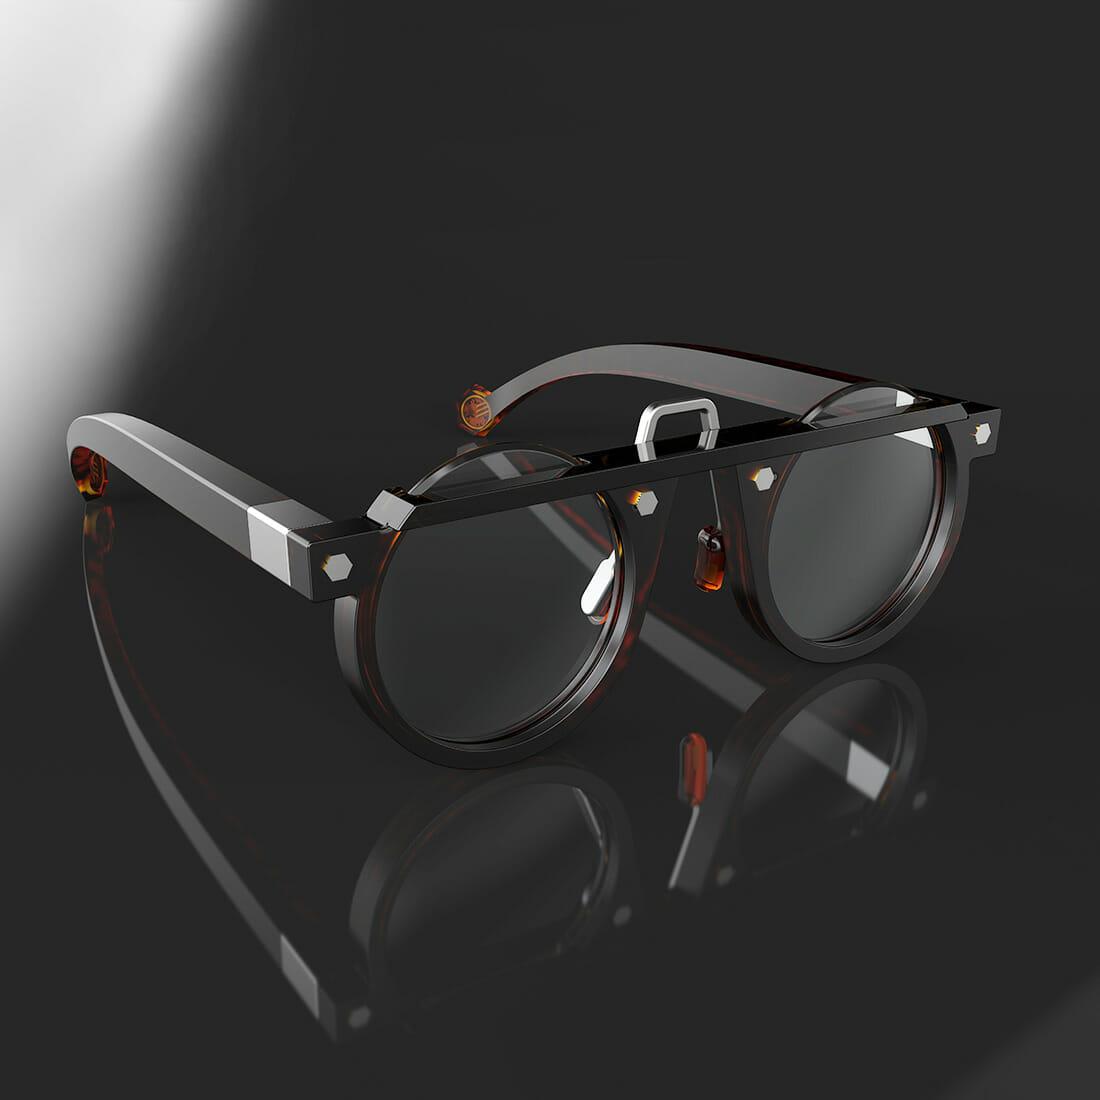 zeroundici eyewear occhiali cit turin designer Alberto De Siati